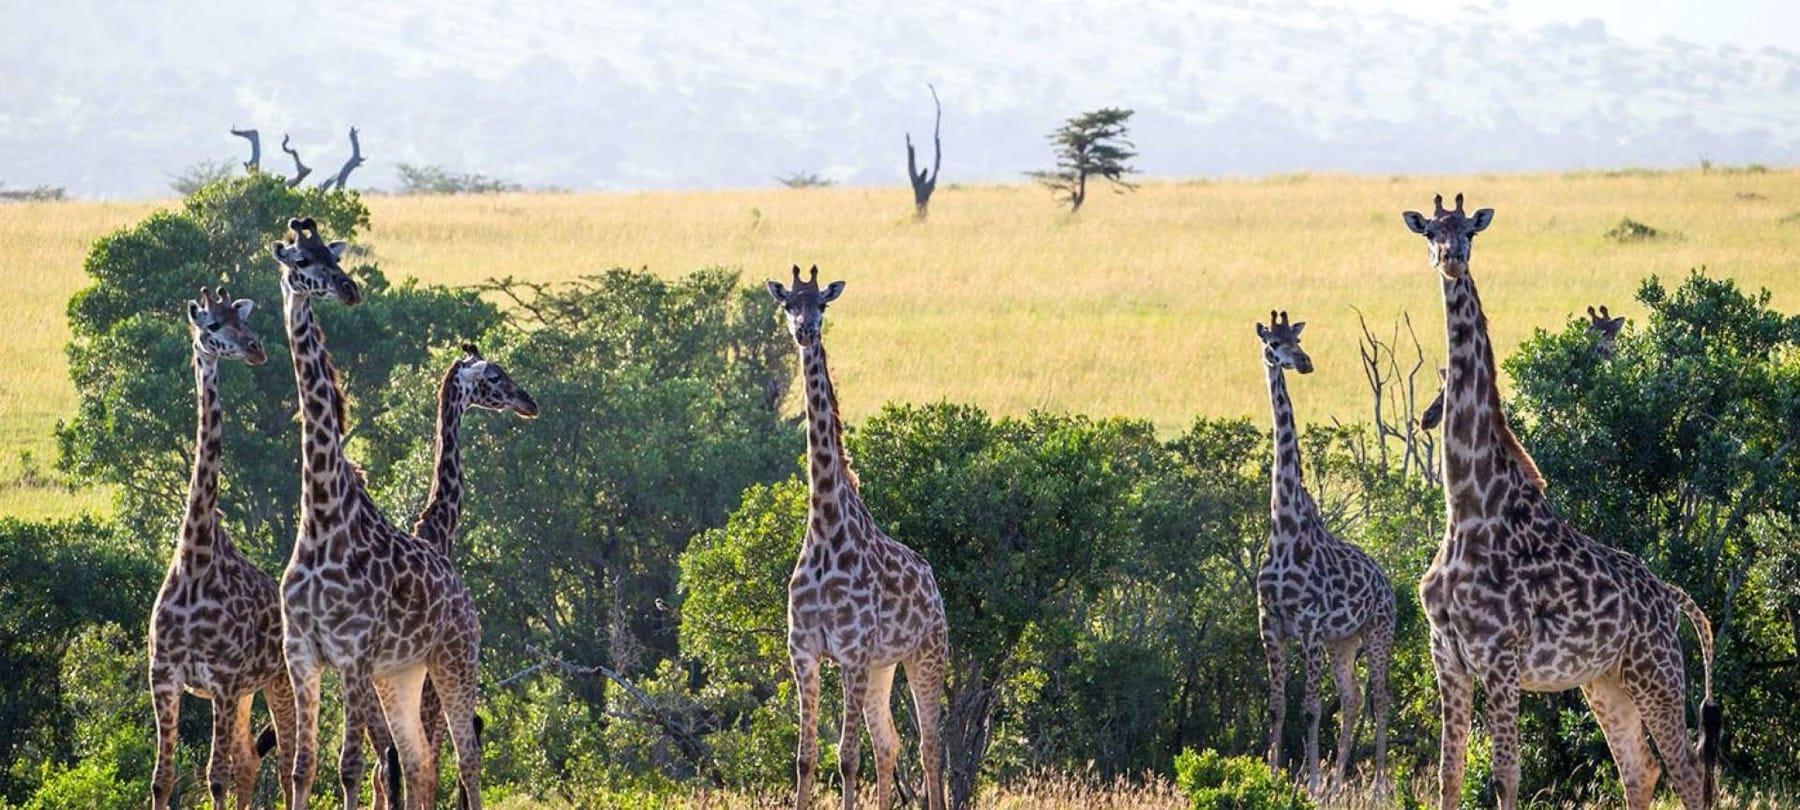 Giraffe in the Serengeti strike a pose